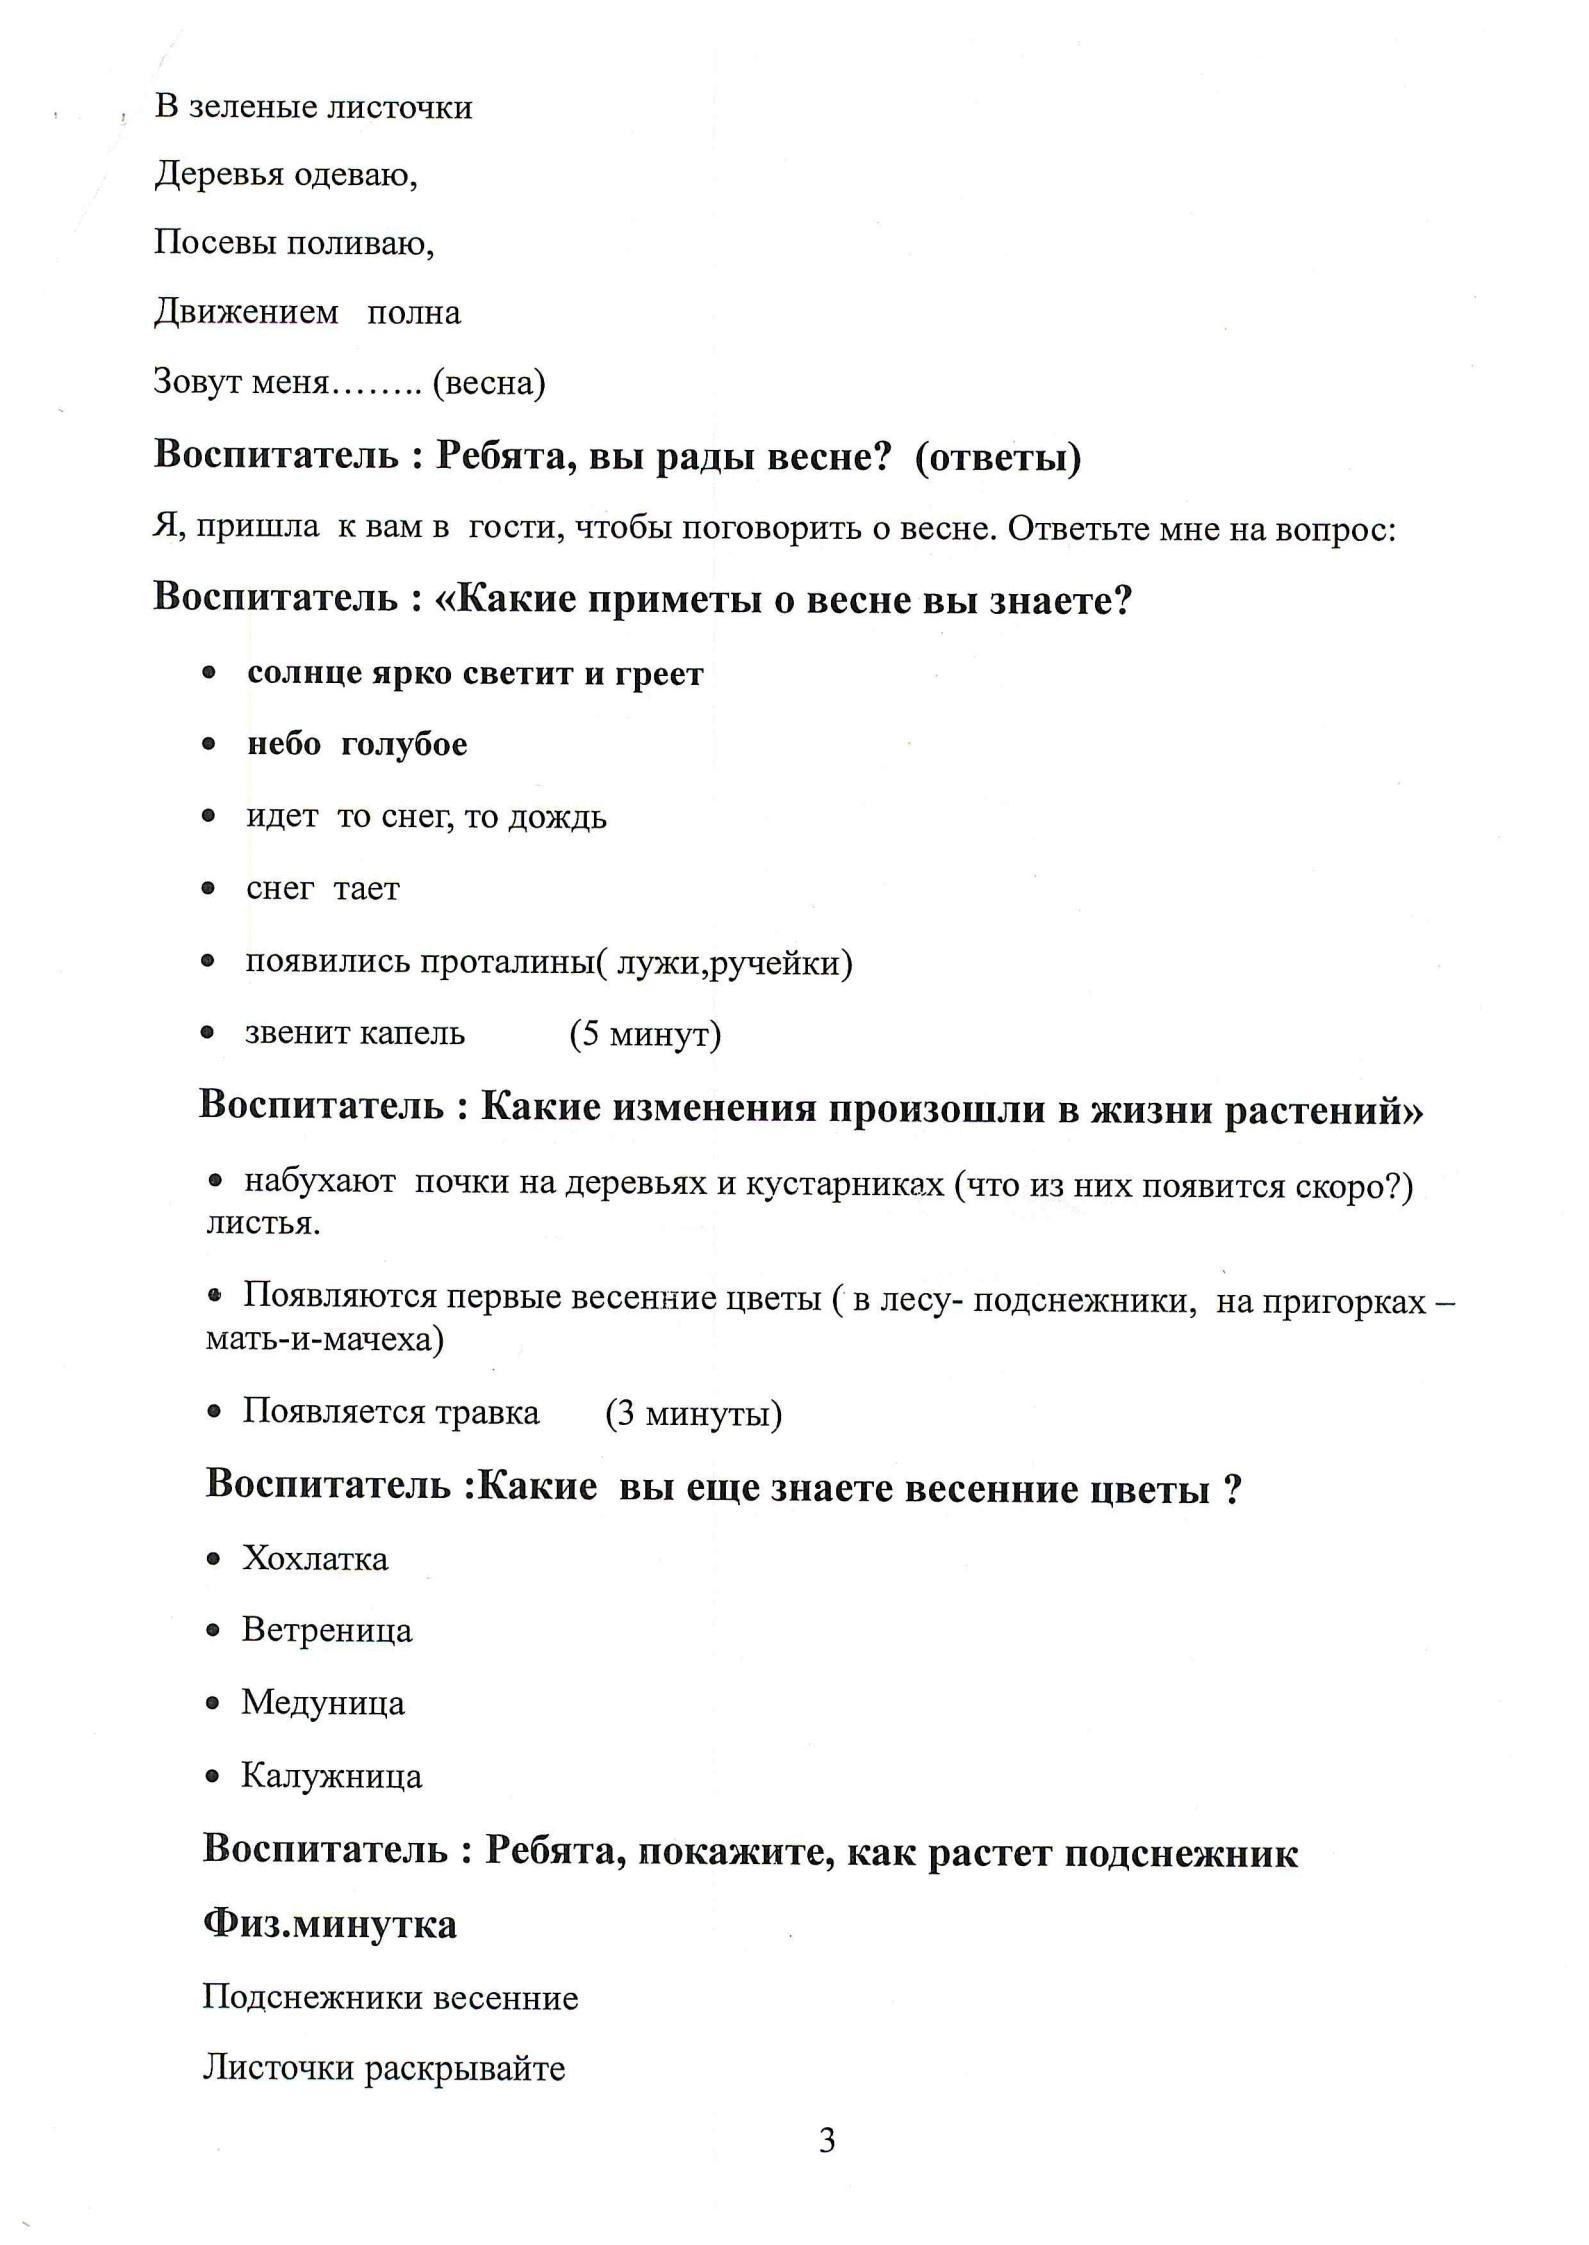 F:\Скан\doc03531820160107130539_003.jpg